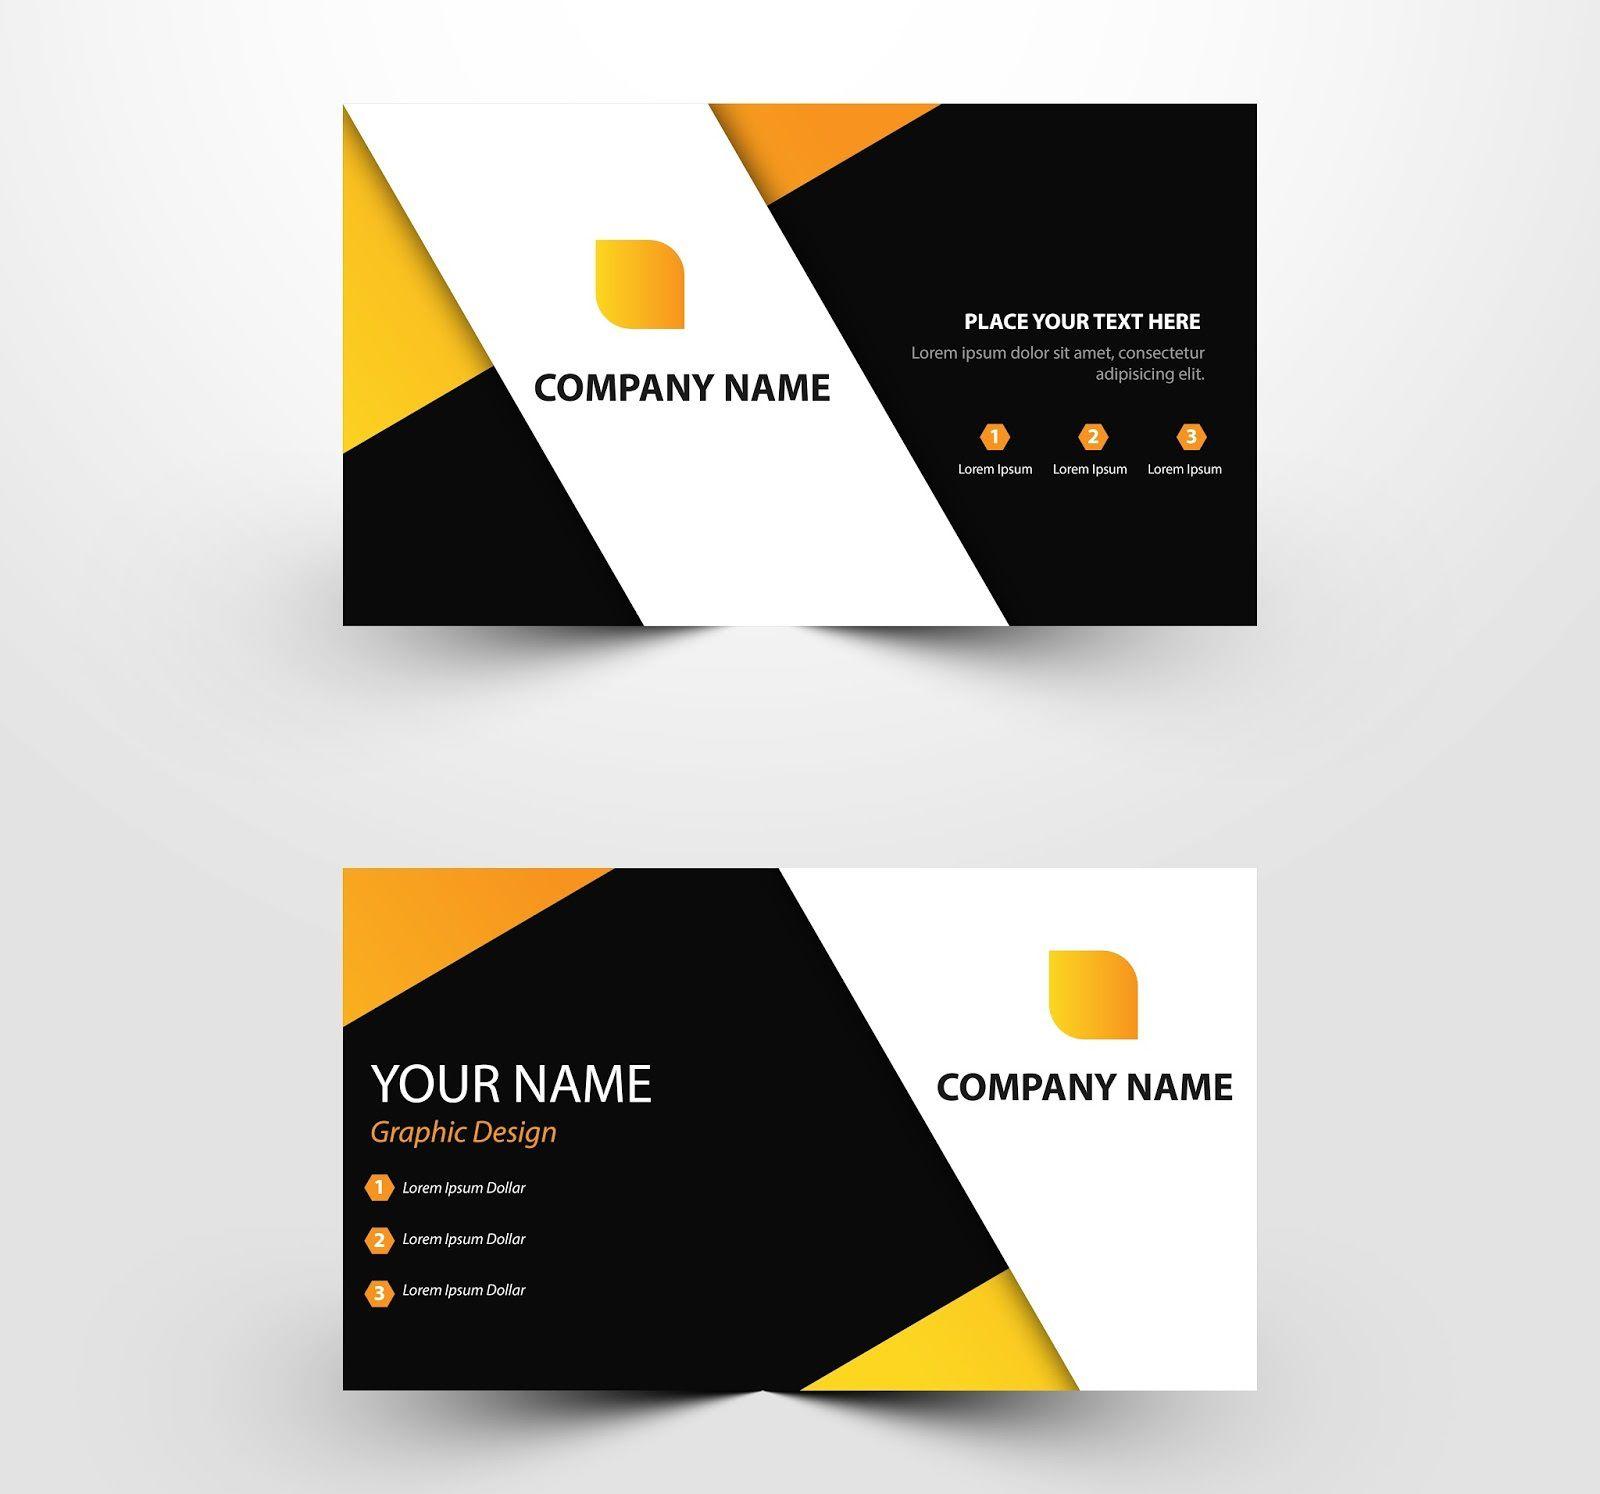 010 Impressive Simple Visiting Card Design Psd File Free Download Concept Full